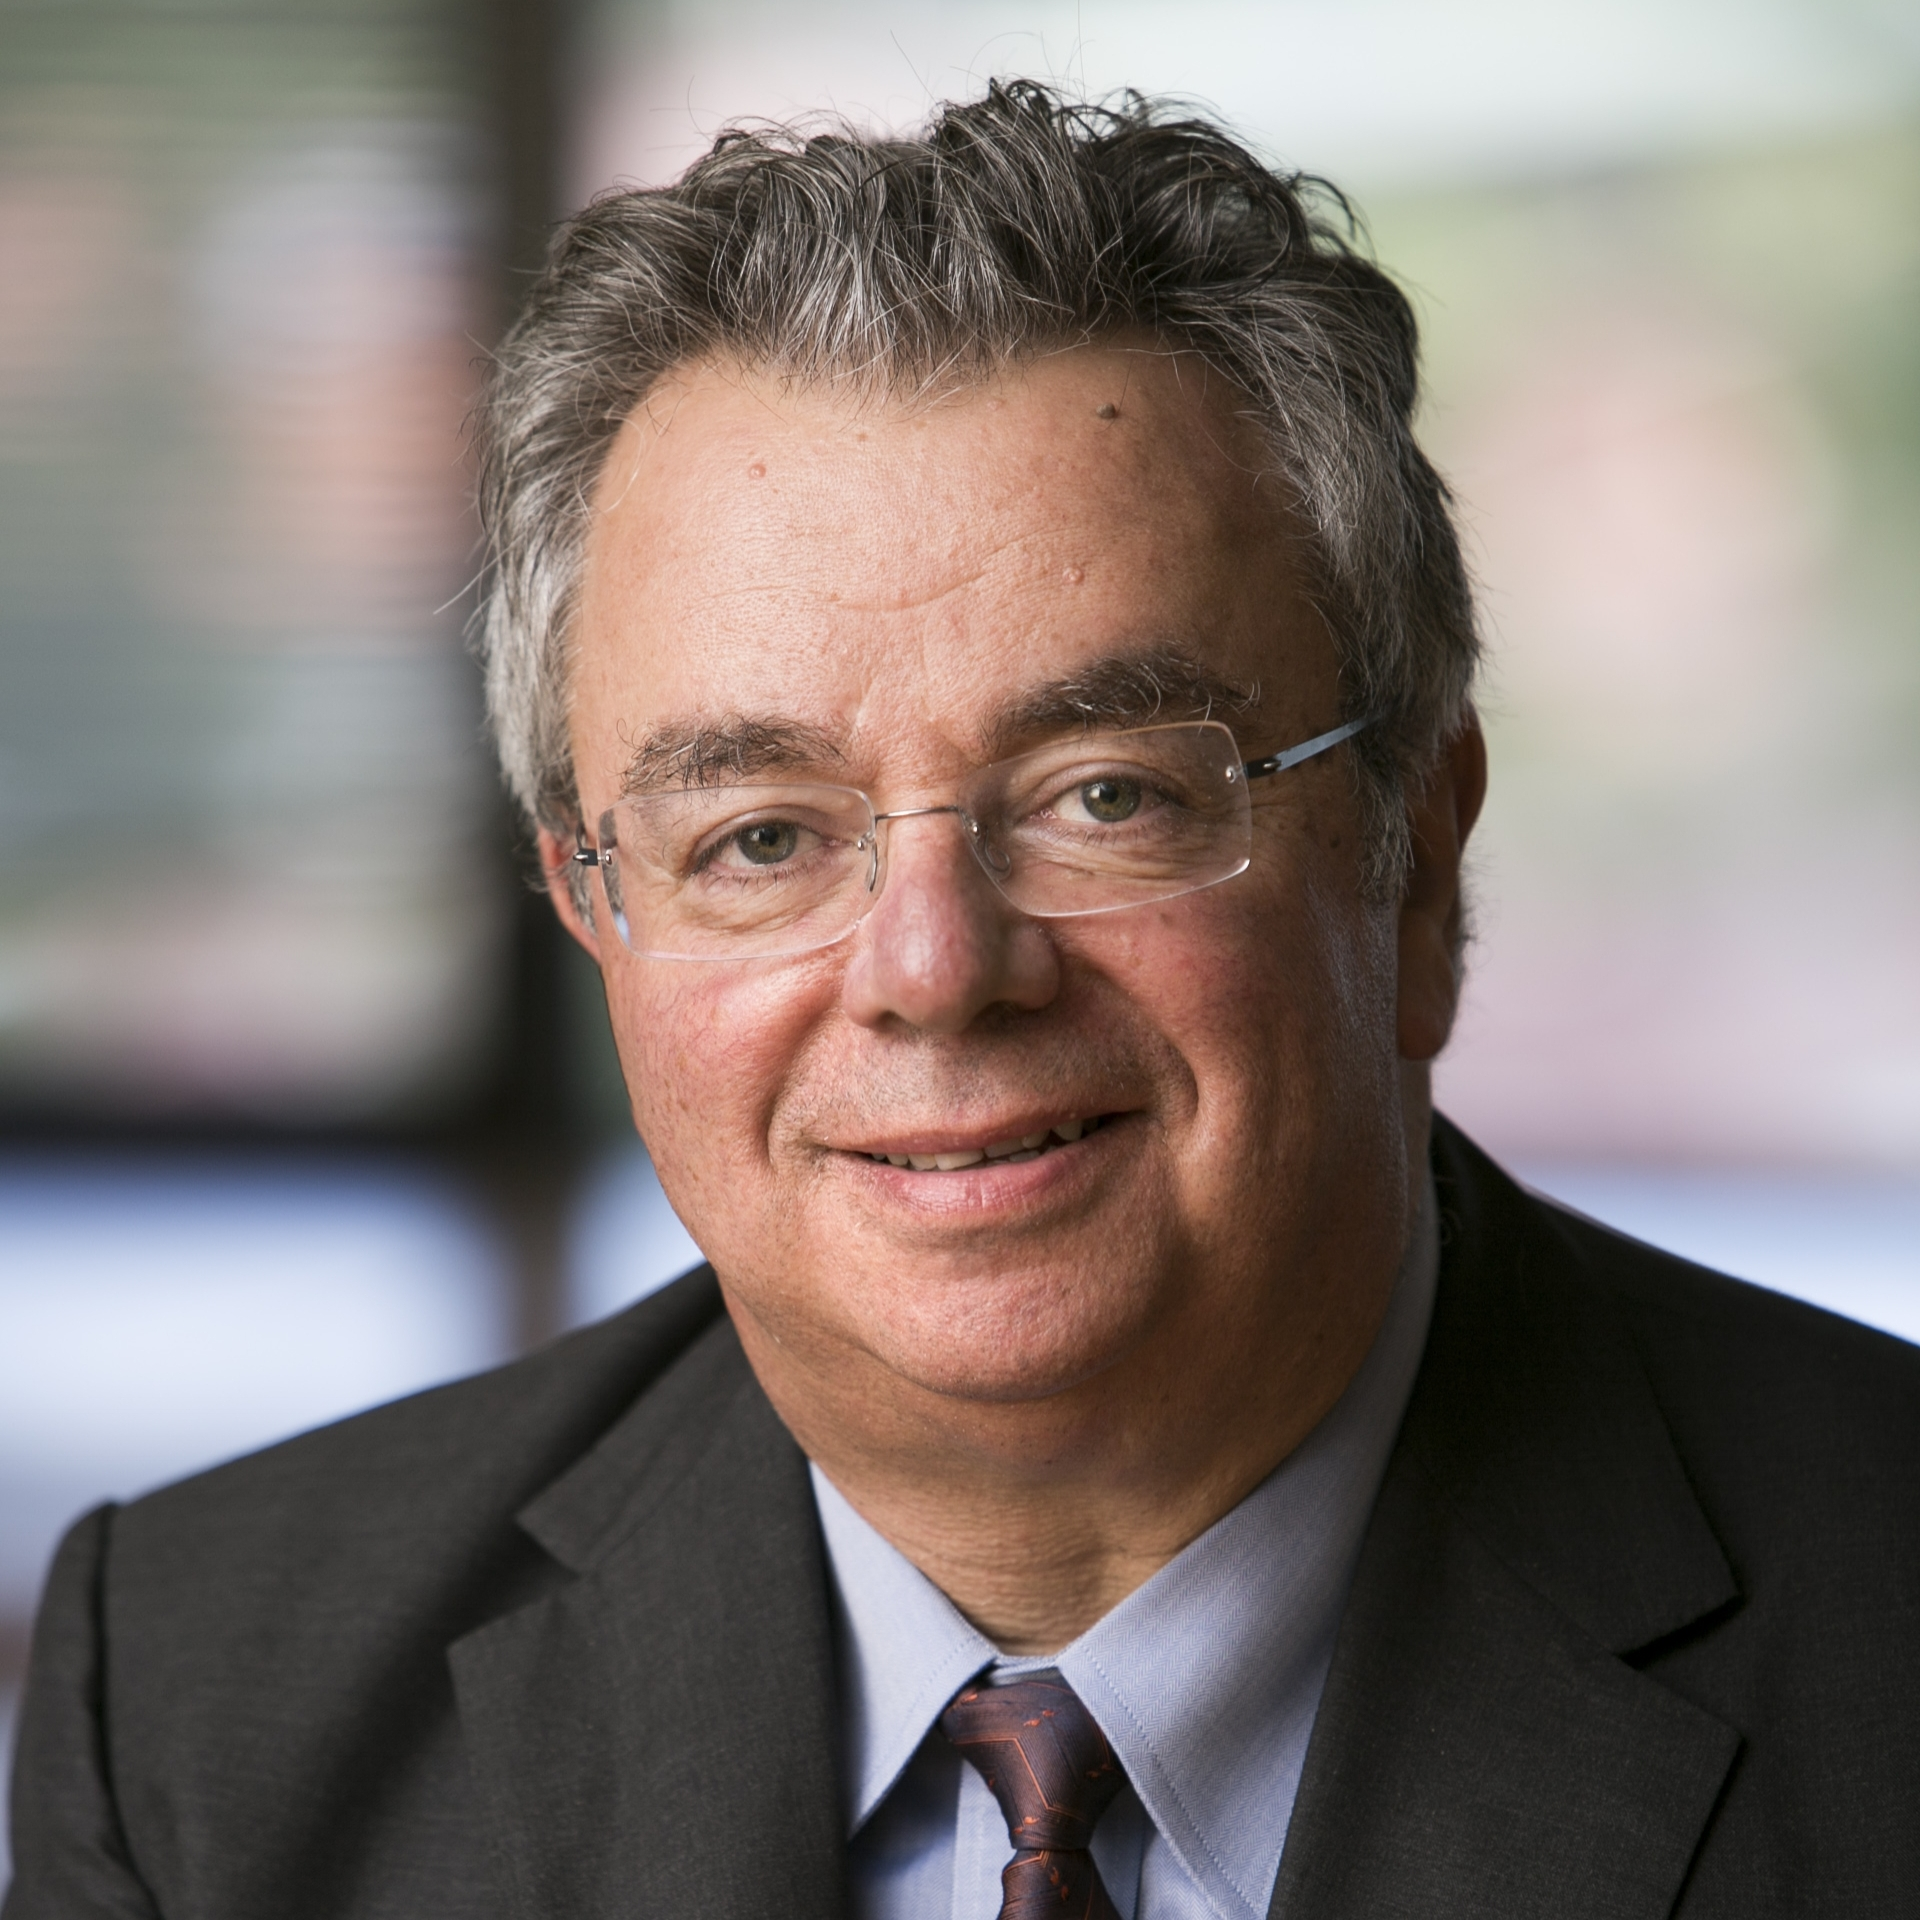 Prof. Ron Grustein